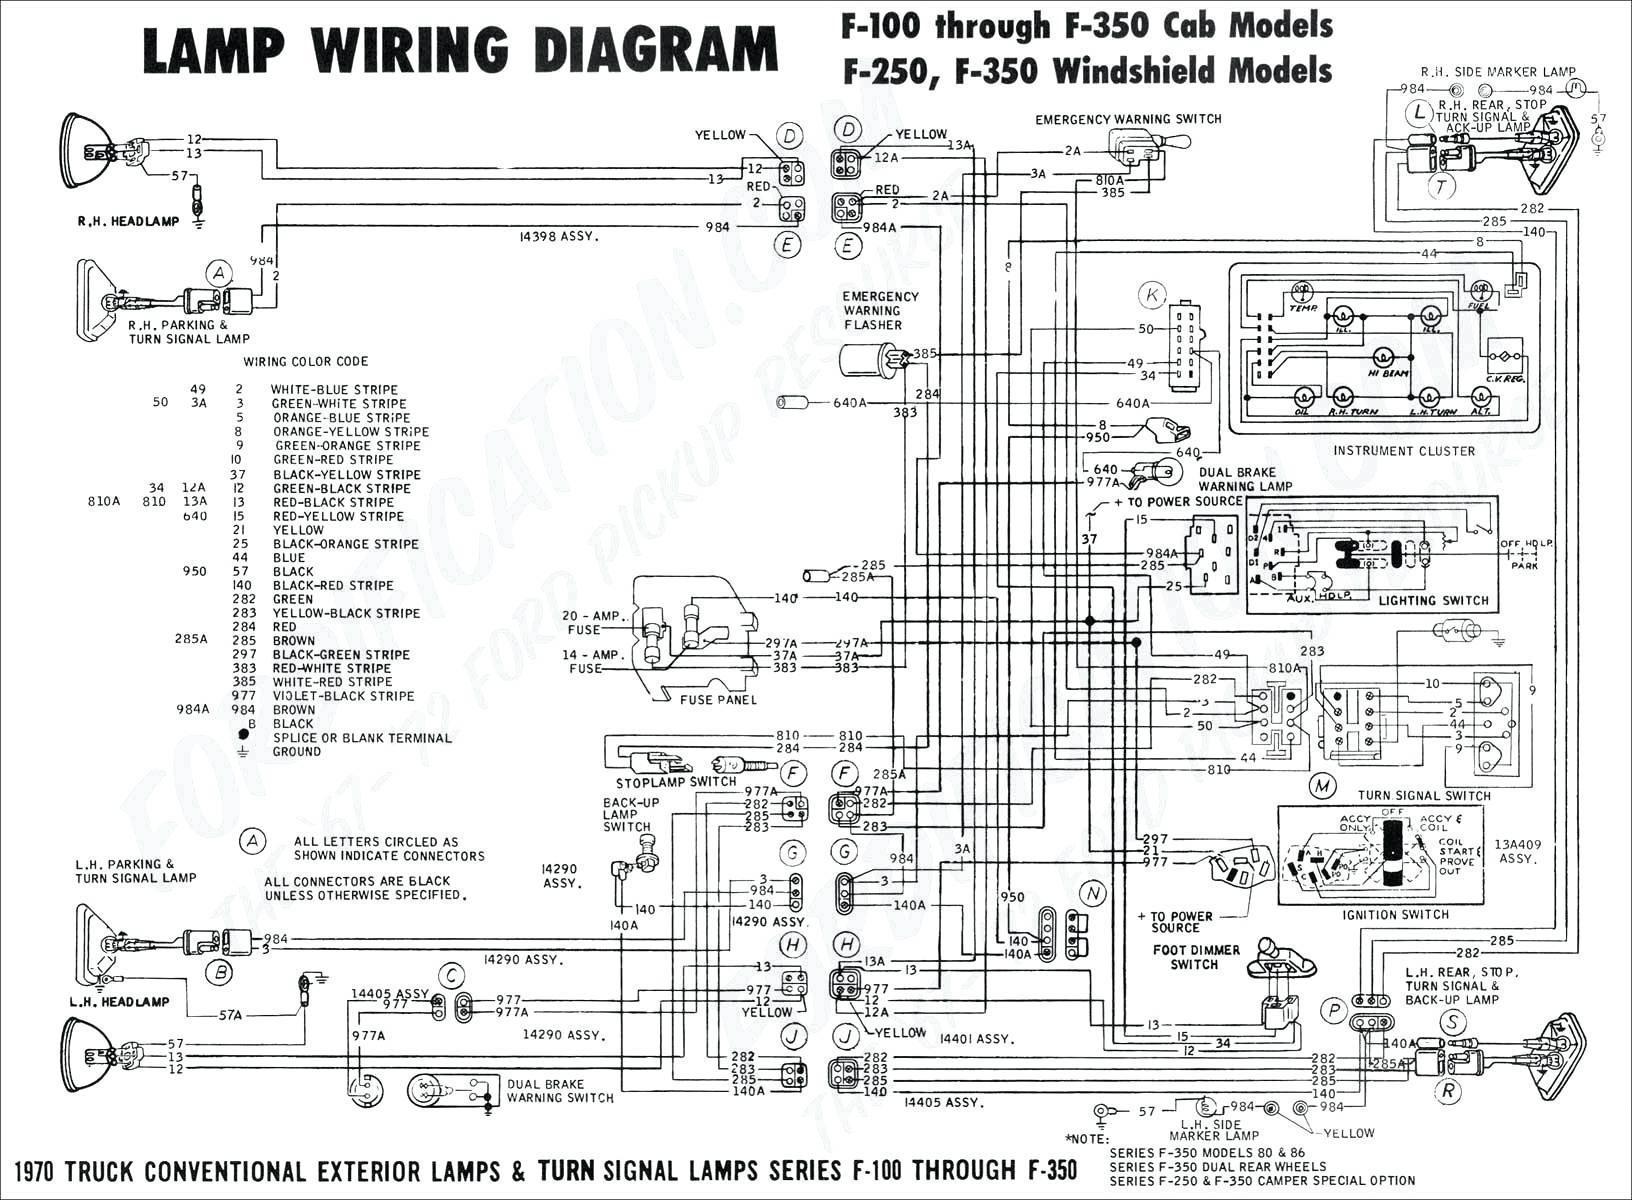 1998 Dodge Ram 1500 Engine Diagram Dodge Ram 1500 Wiring Diagram Free Example 2006 Dodge Ram 1500 Of 1998 Dodge Ram 1500 Engine Diagram